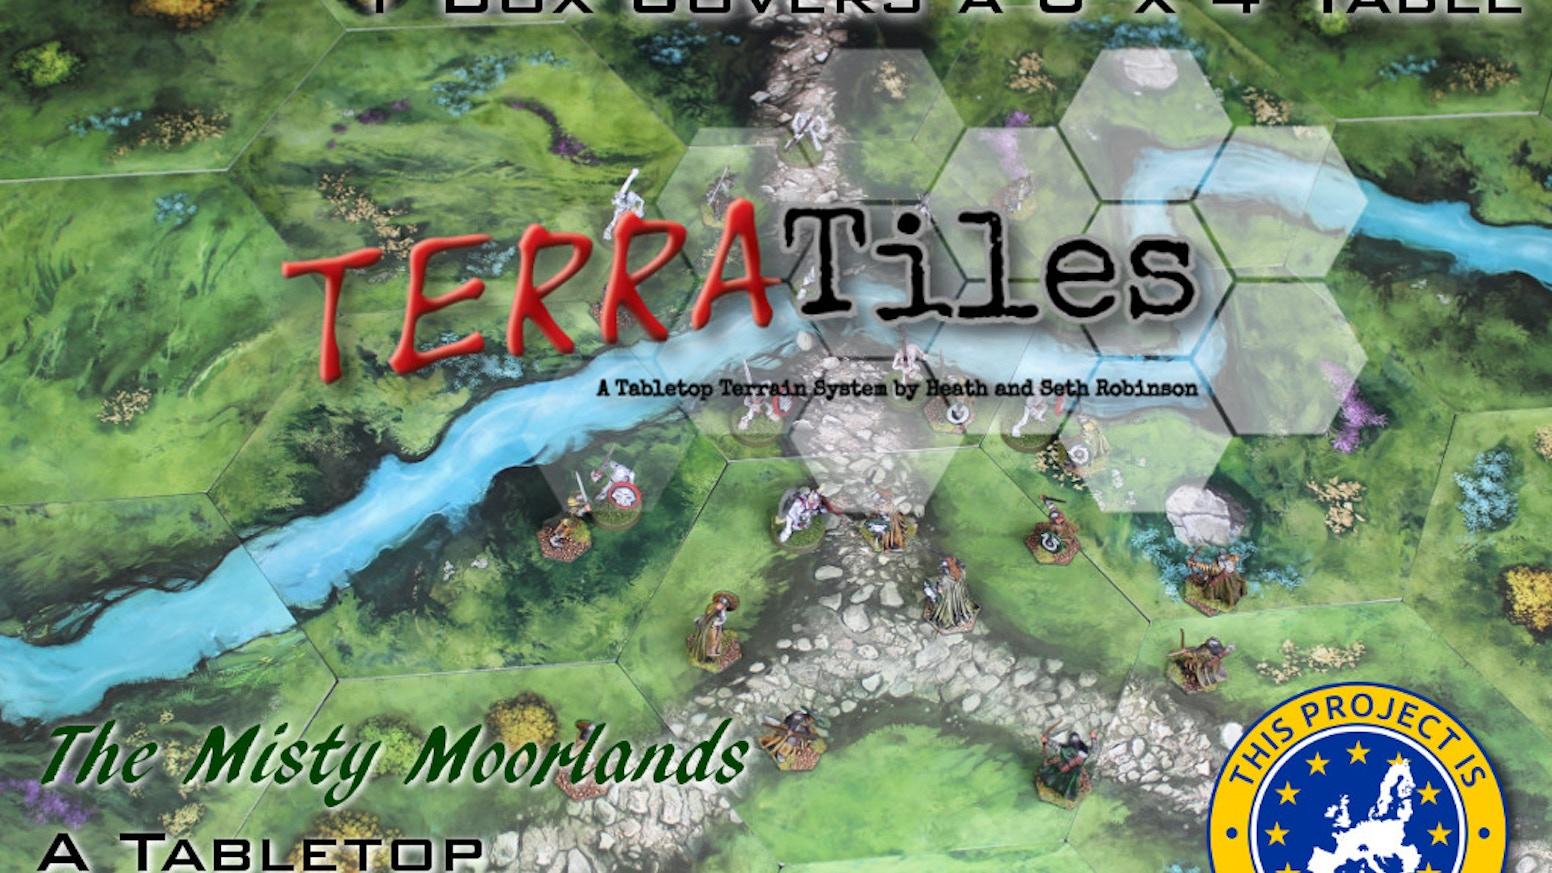 TERRATiles: A Tabletop Terrain System by Heath and Seth Robinson